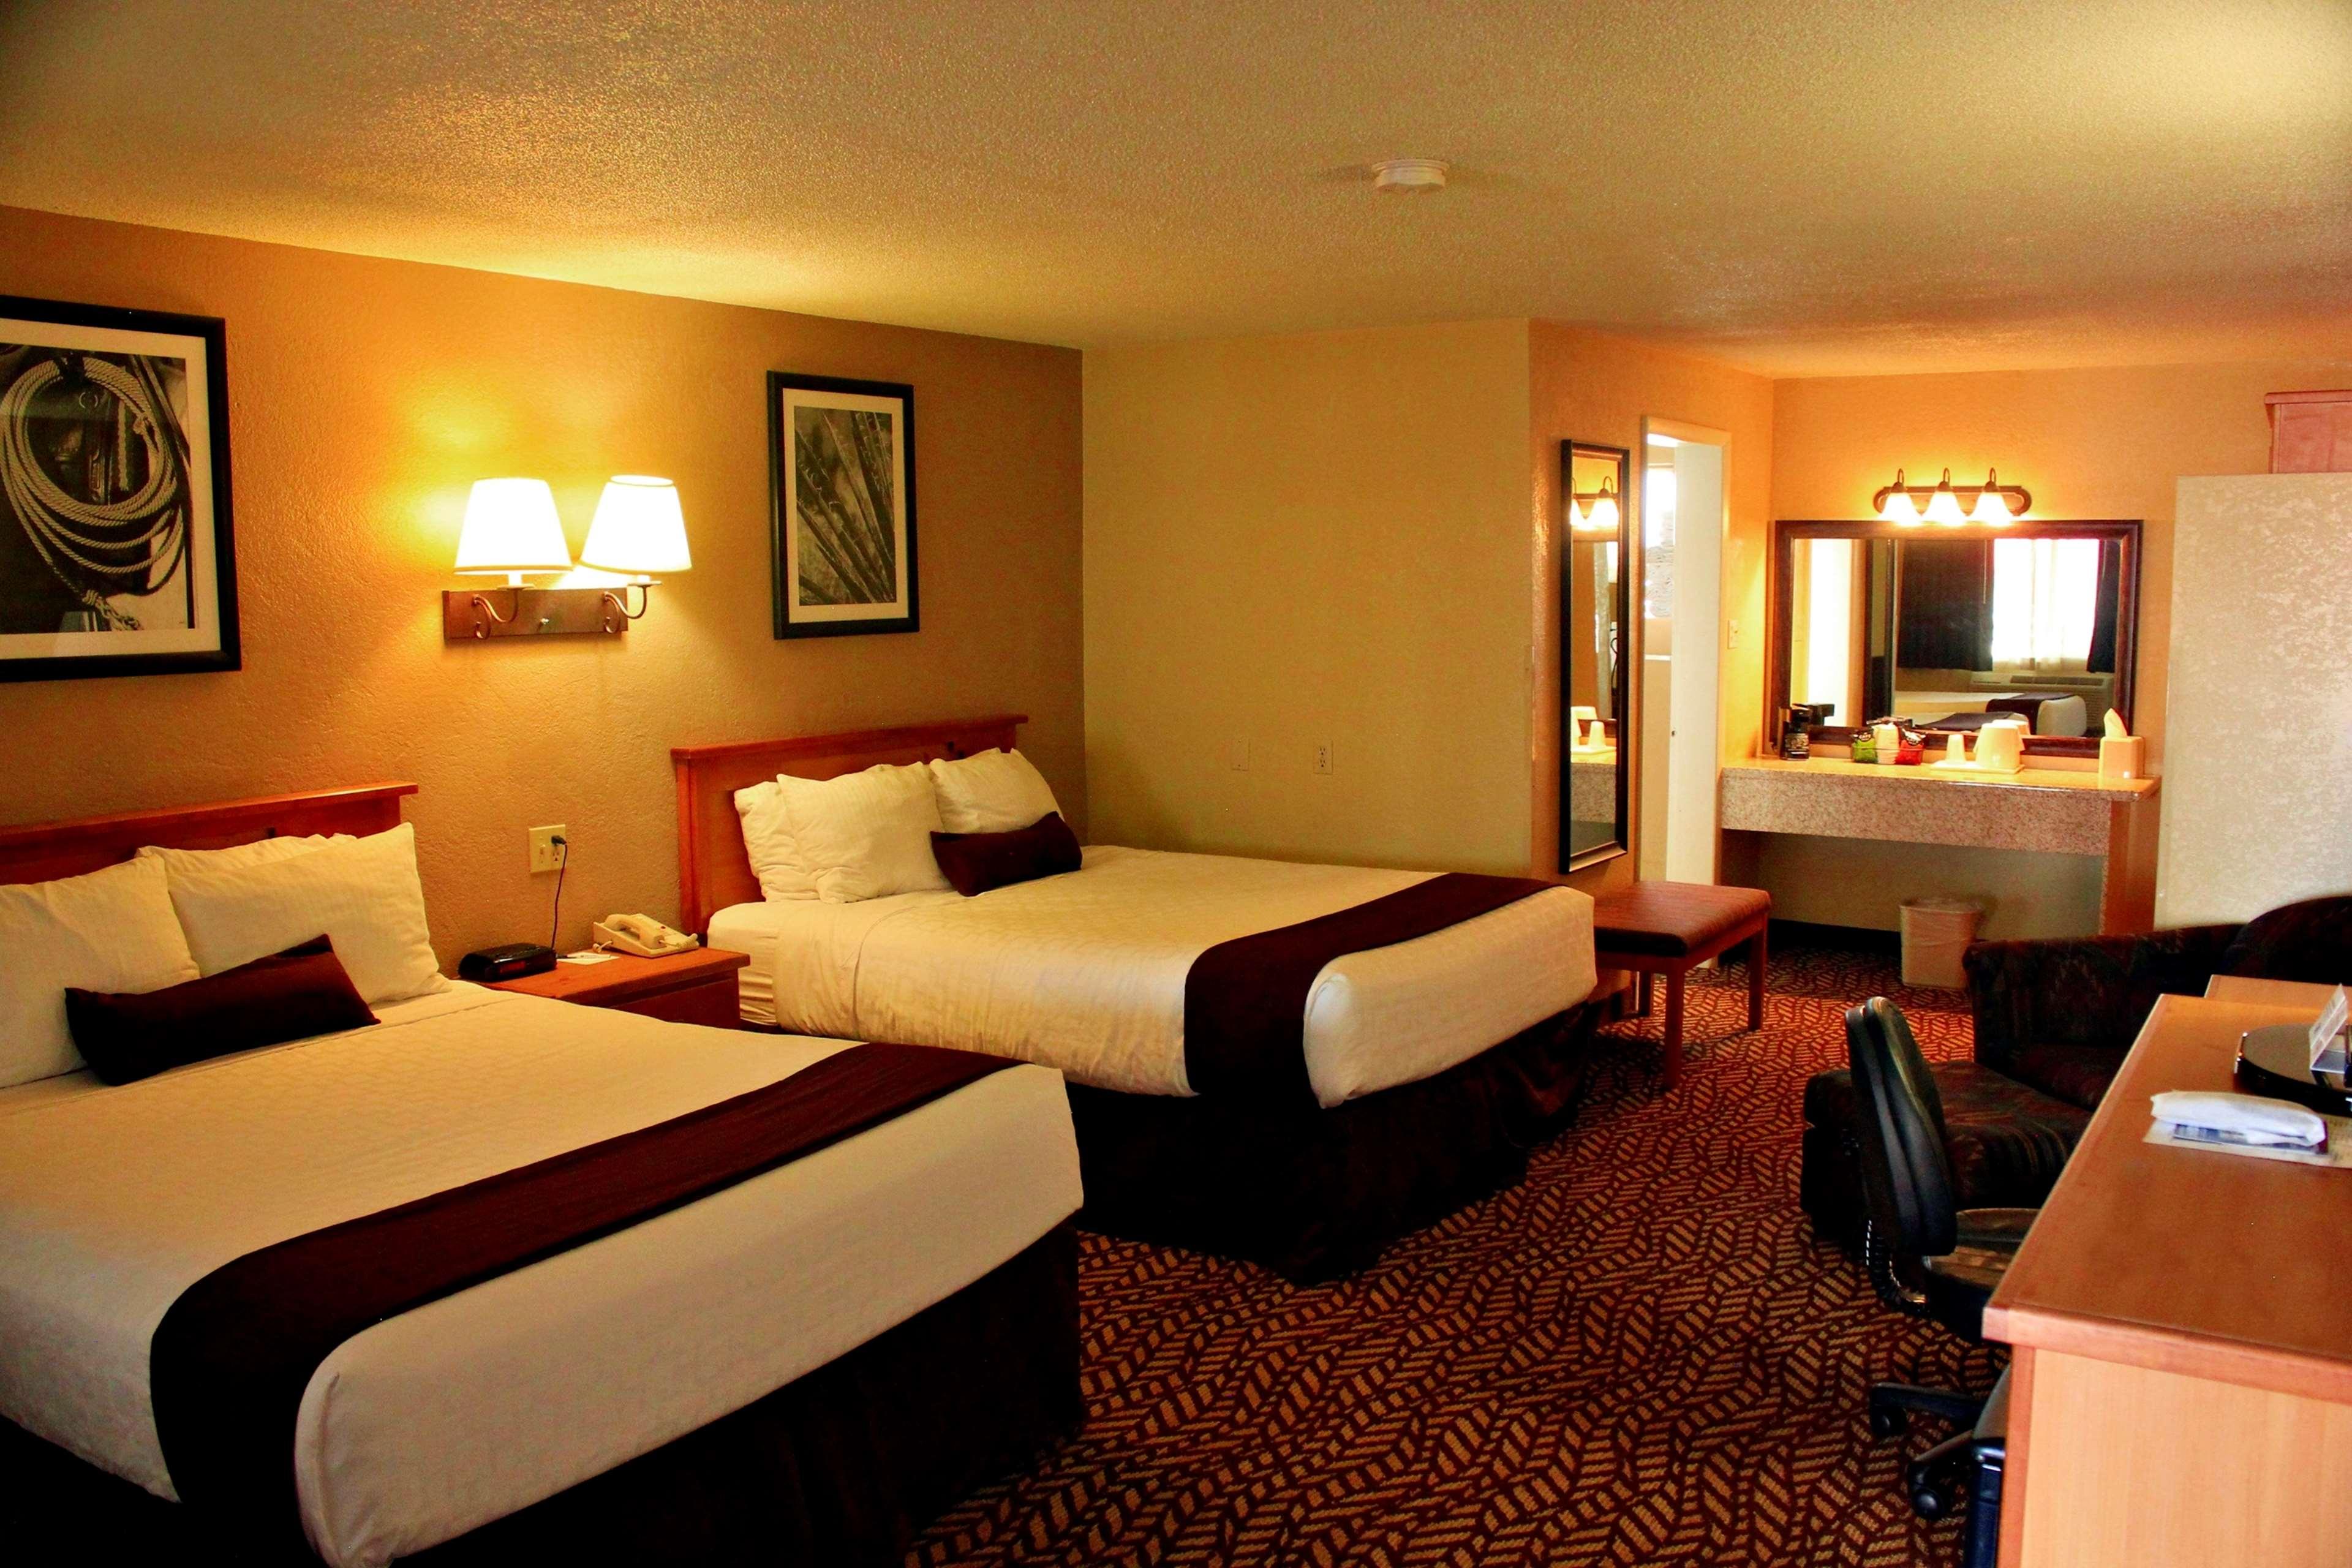 Best Western Turquoise Inn & Suites image 14